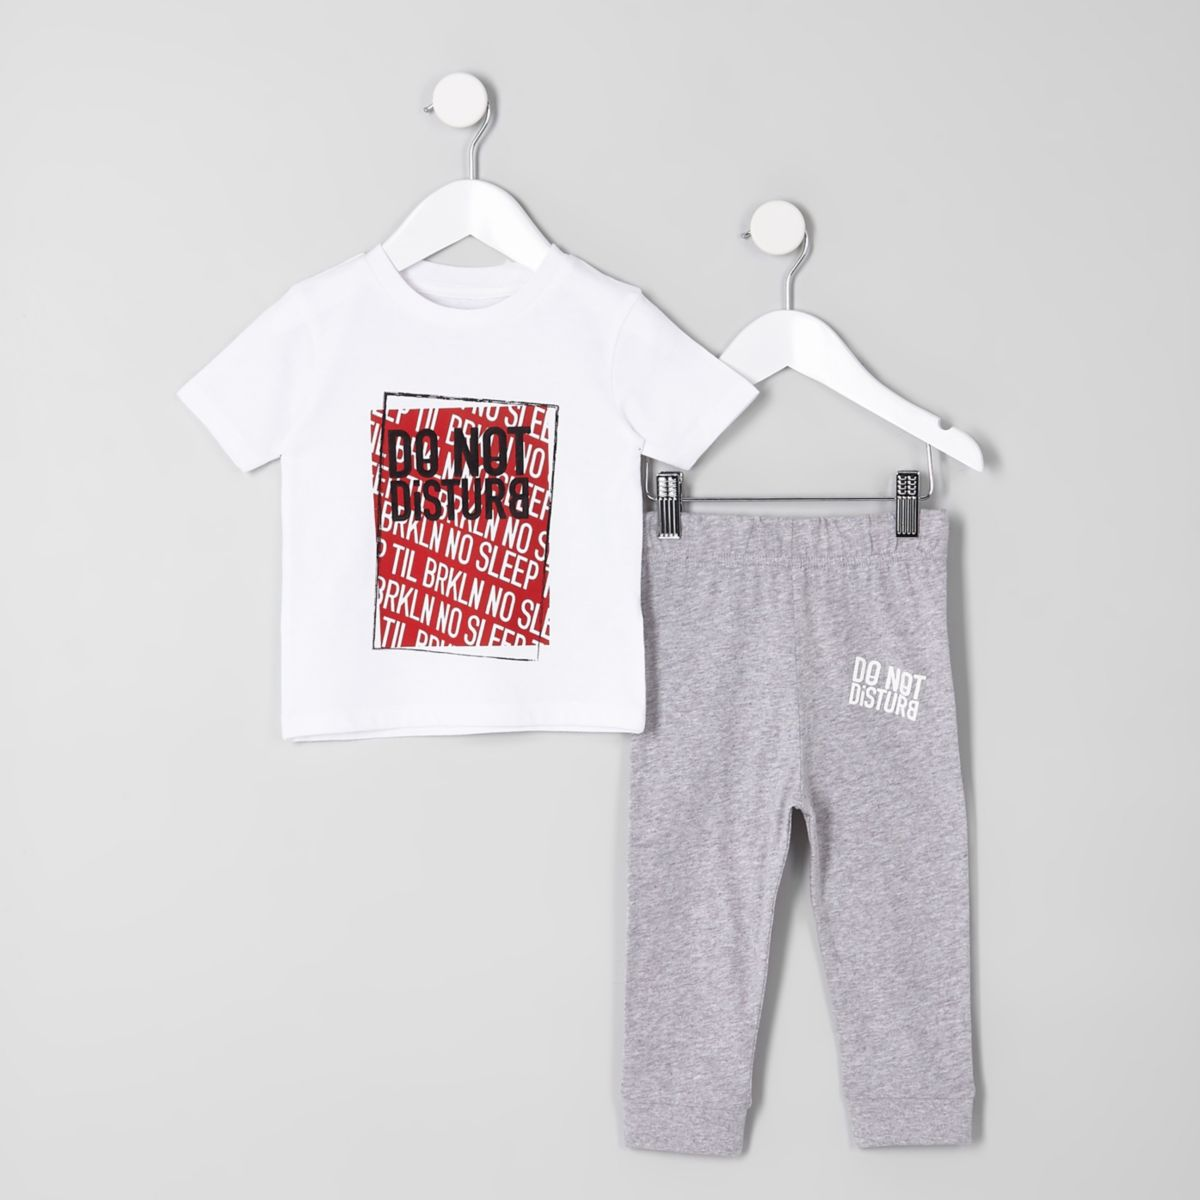 Mini boys 'do not disturb' pyjama set